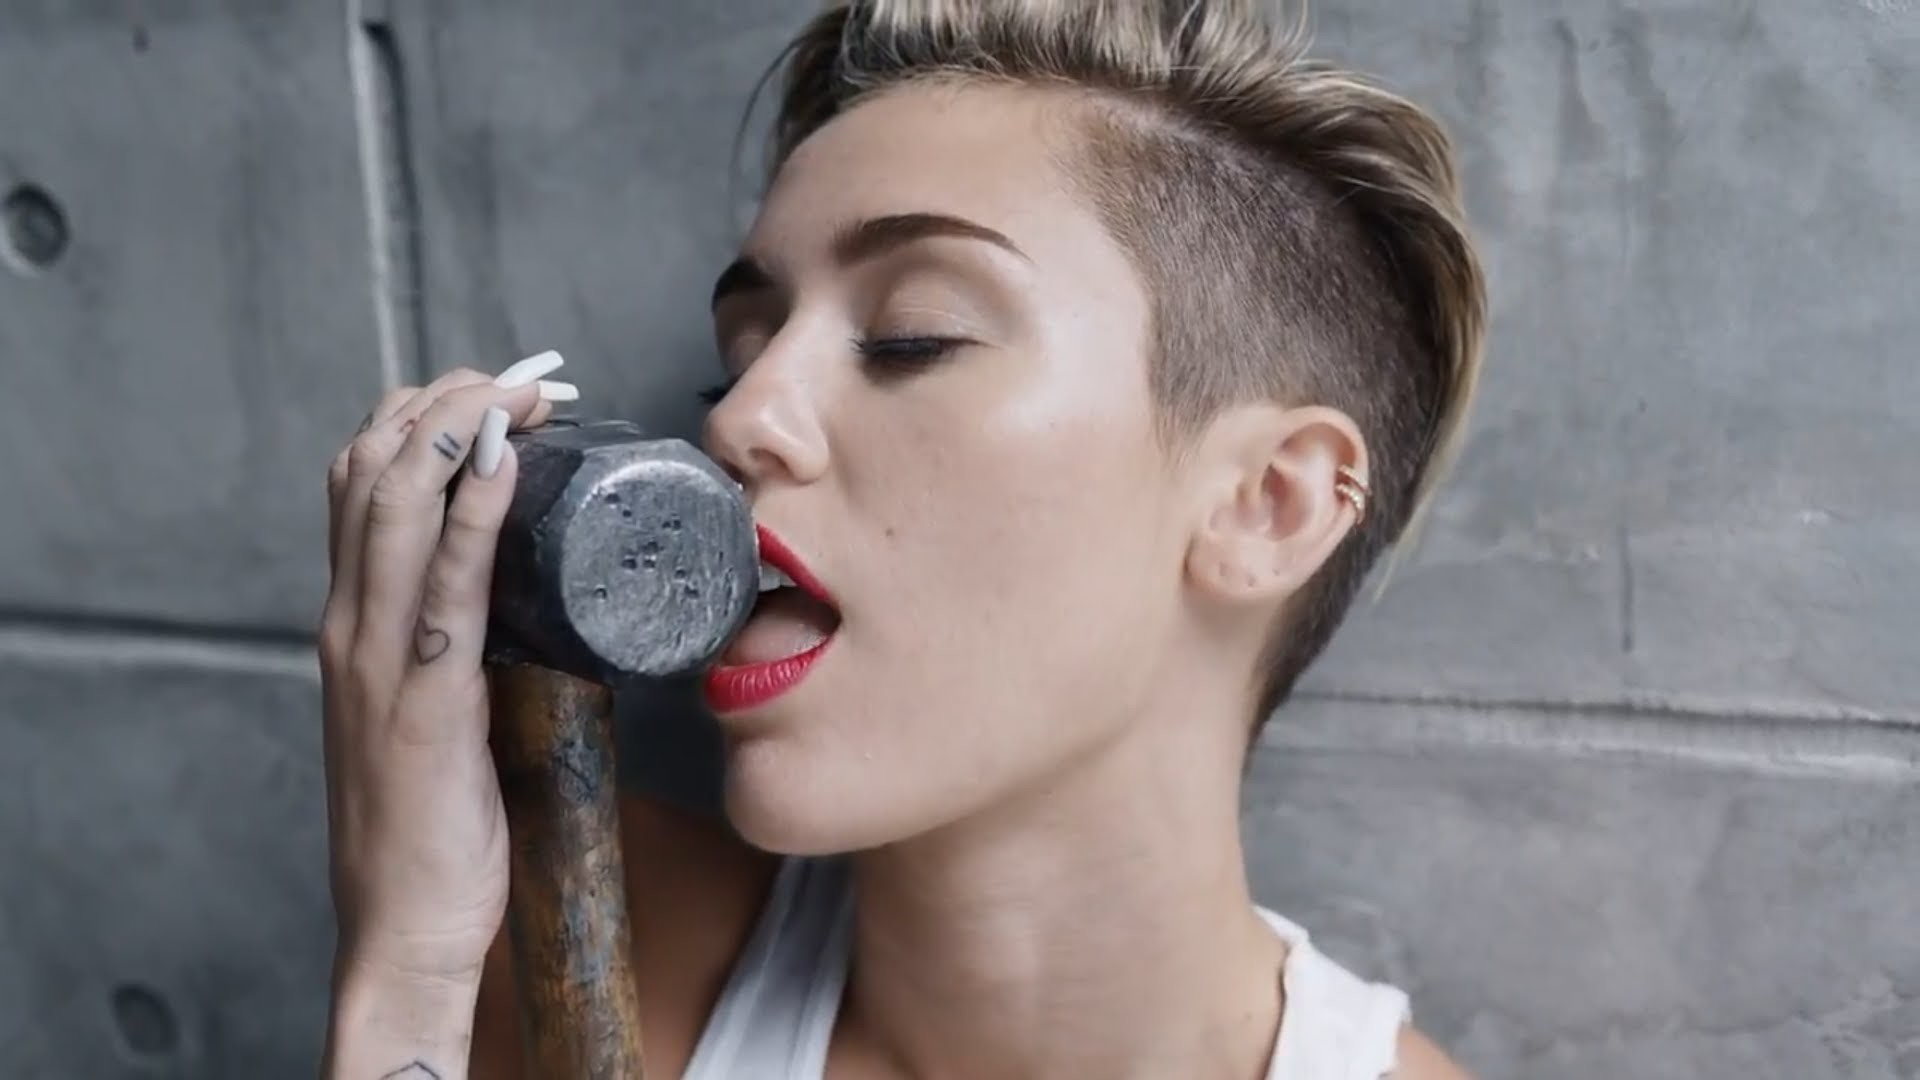 Miley Cyrus Wrecking Ball Tumblr